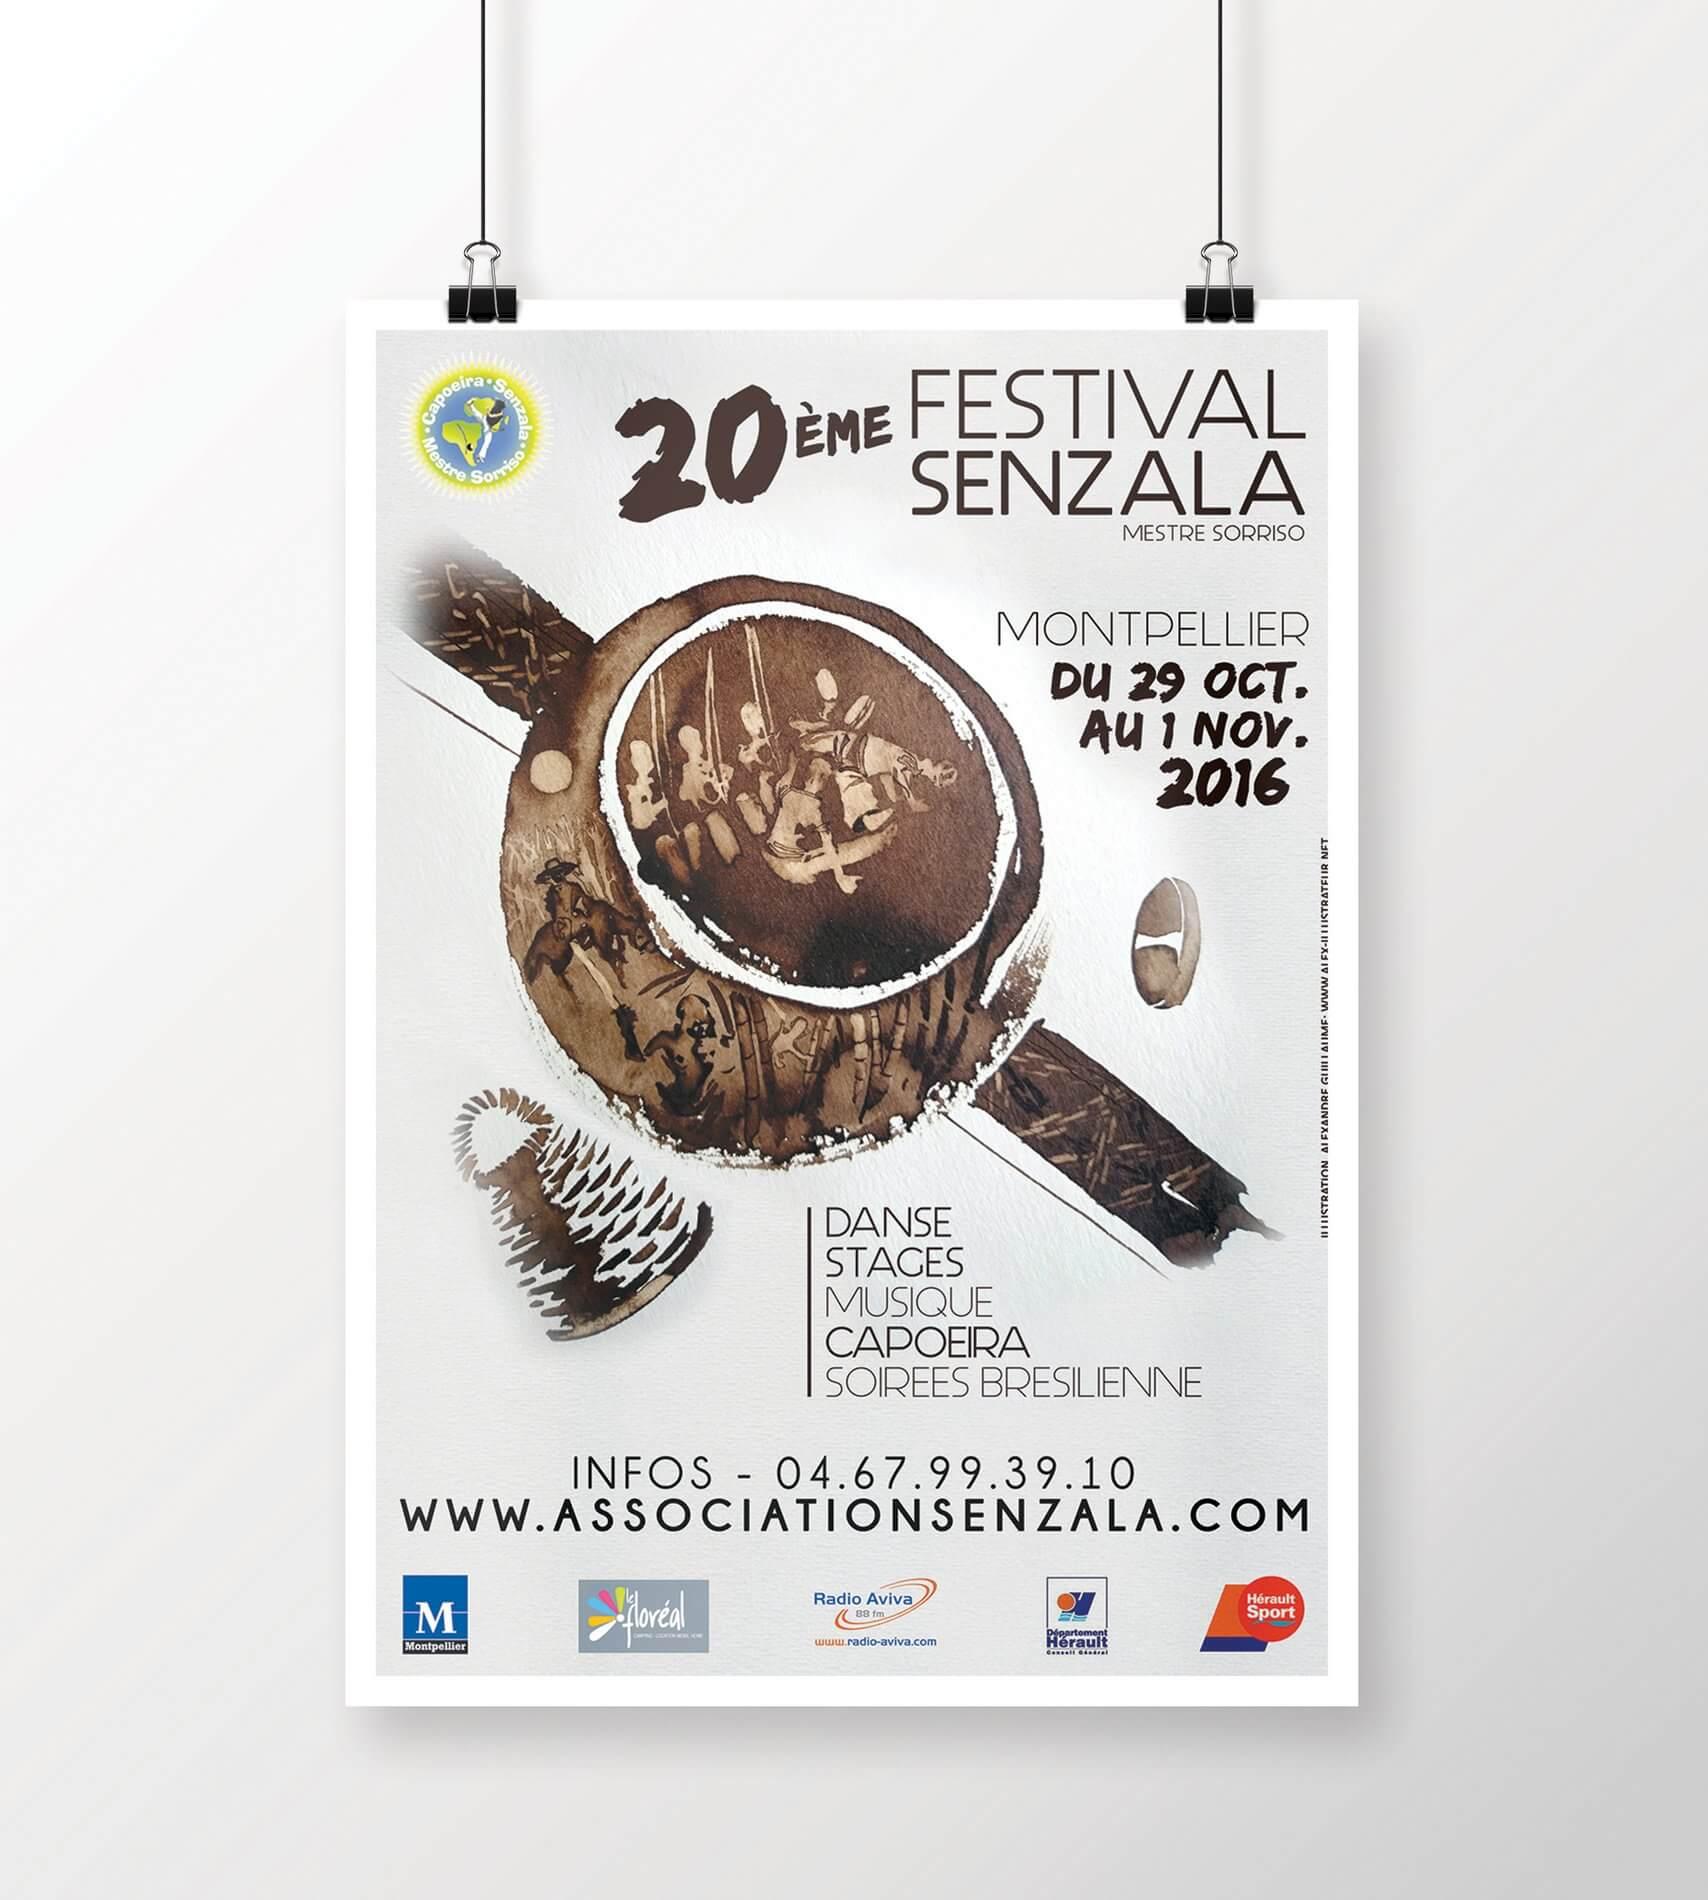 Poster Design Festival Senzala Capoeira